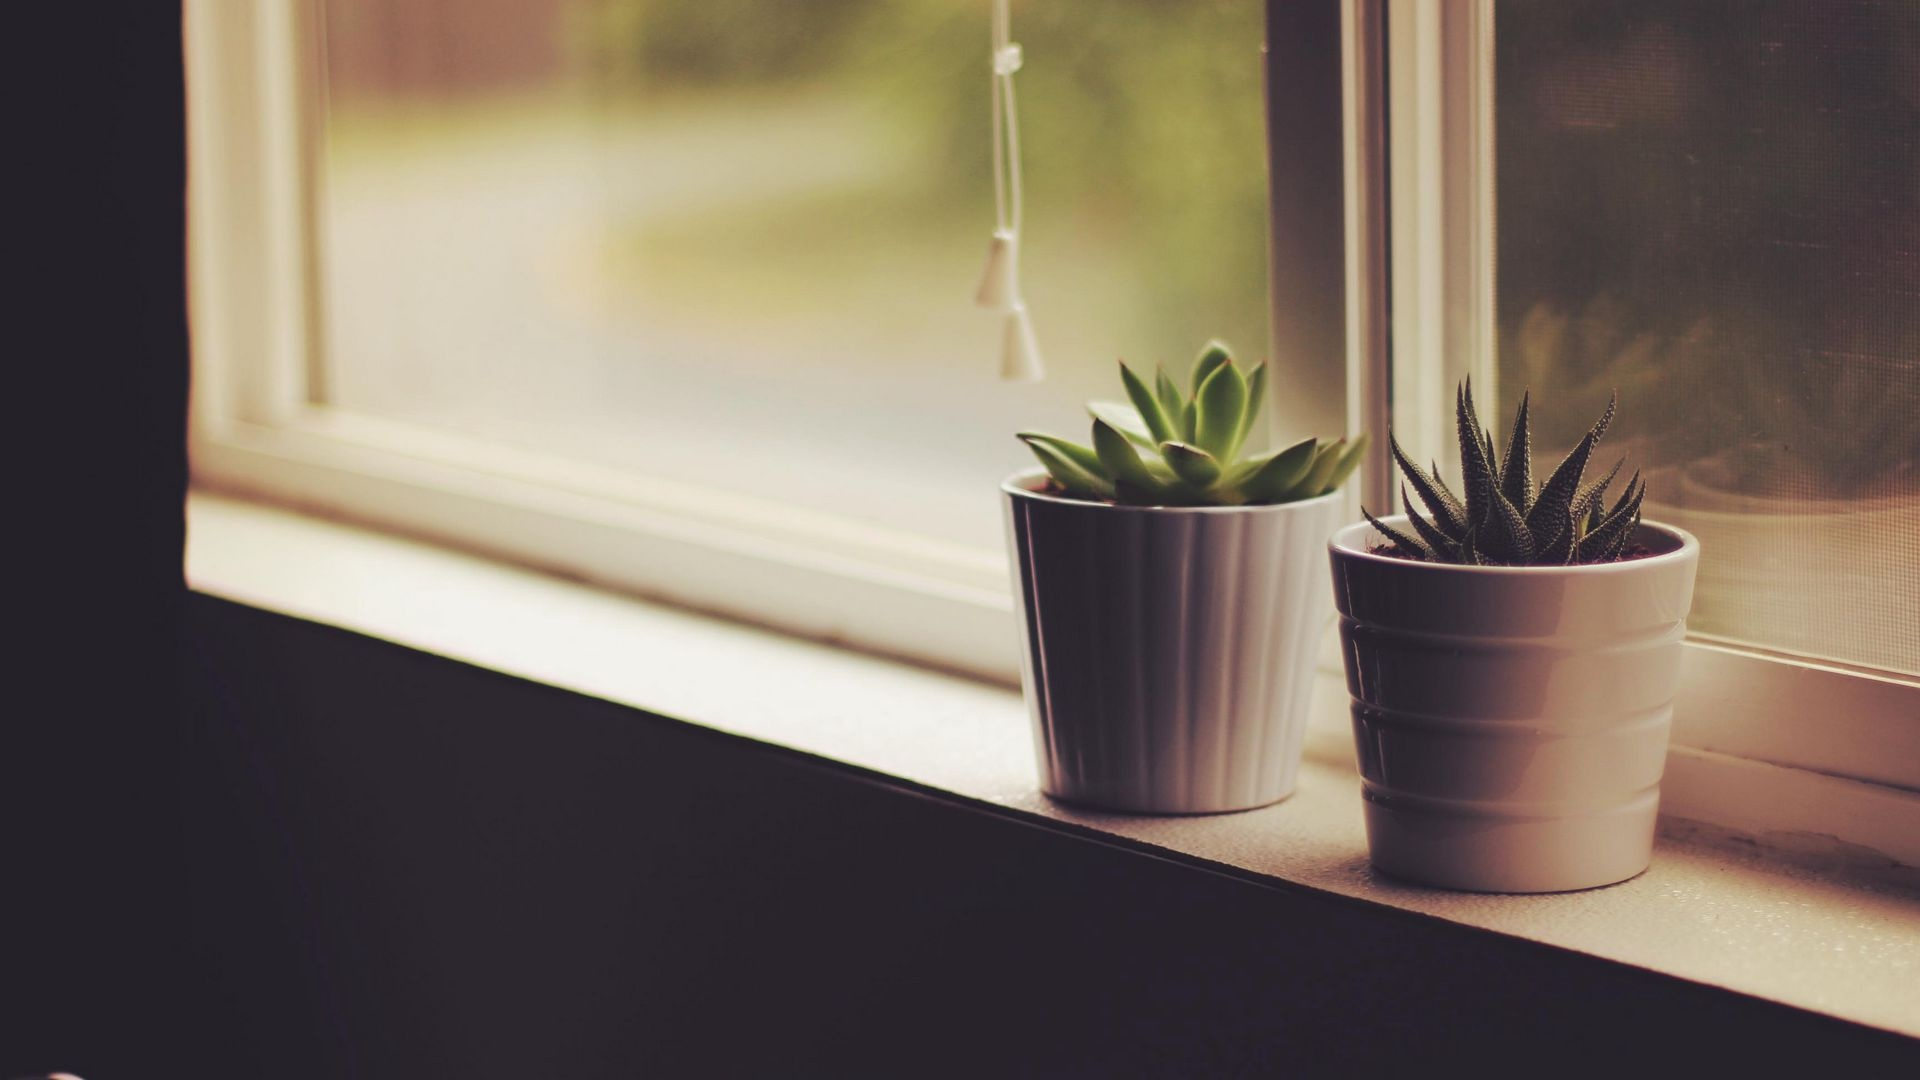 Houseplants free background